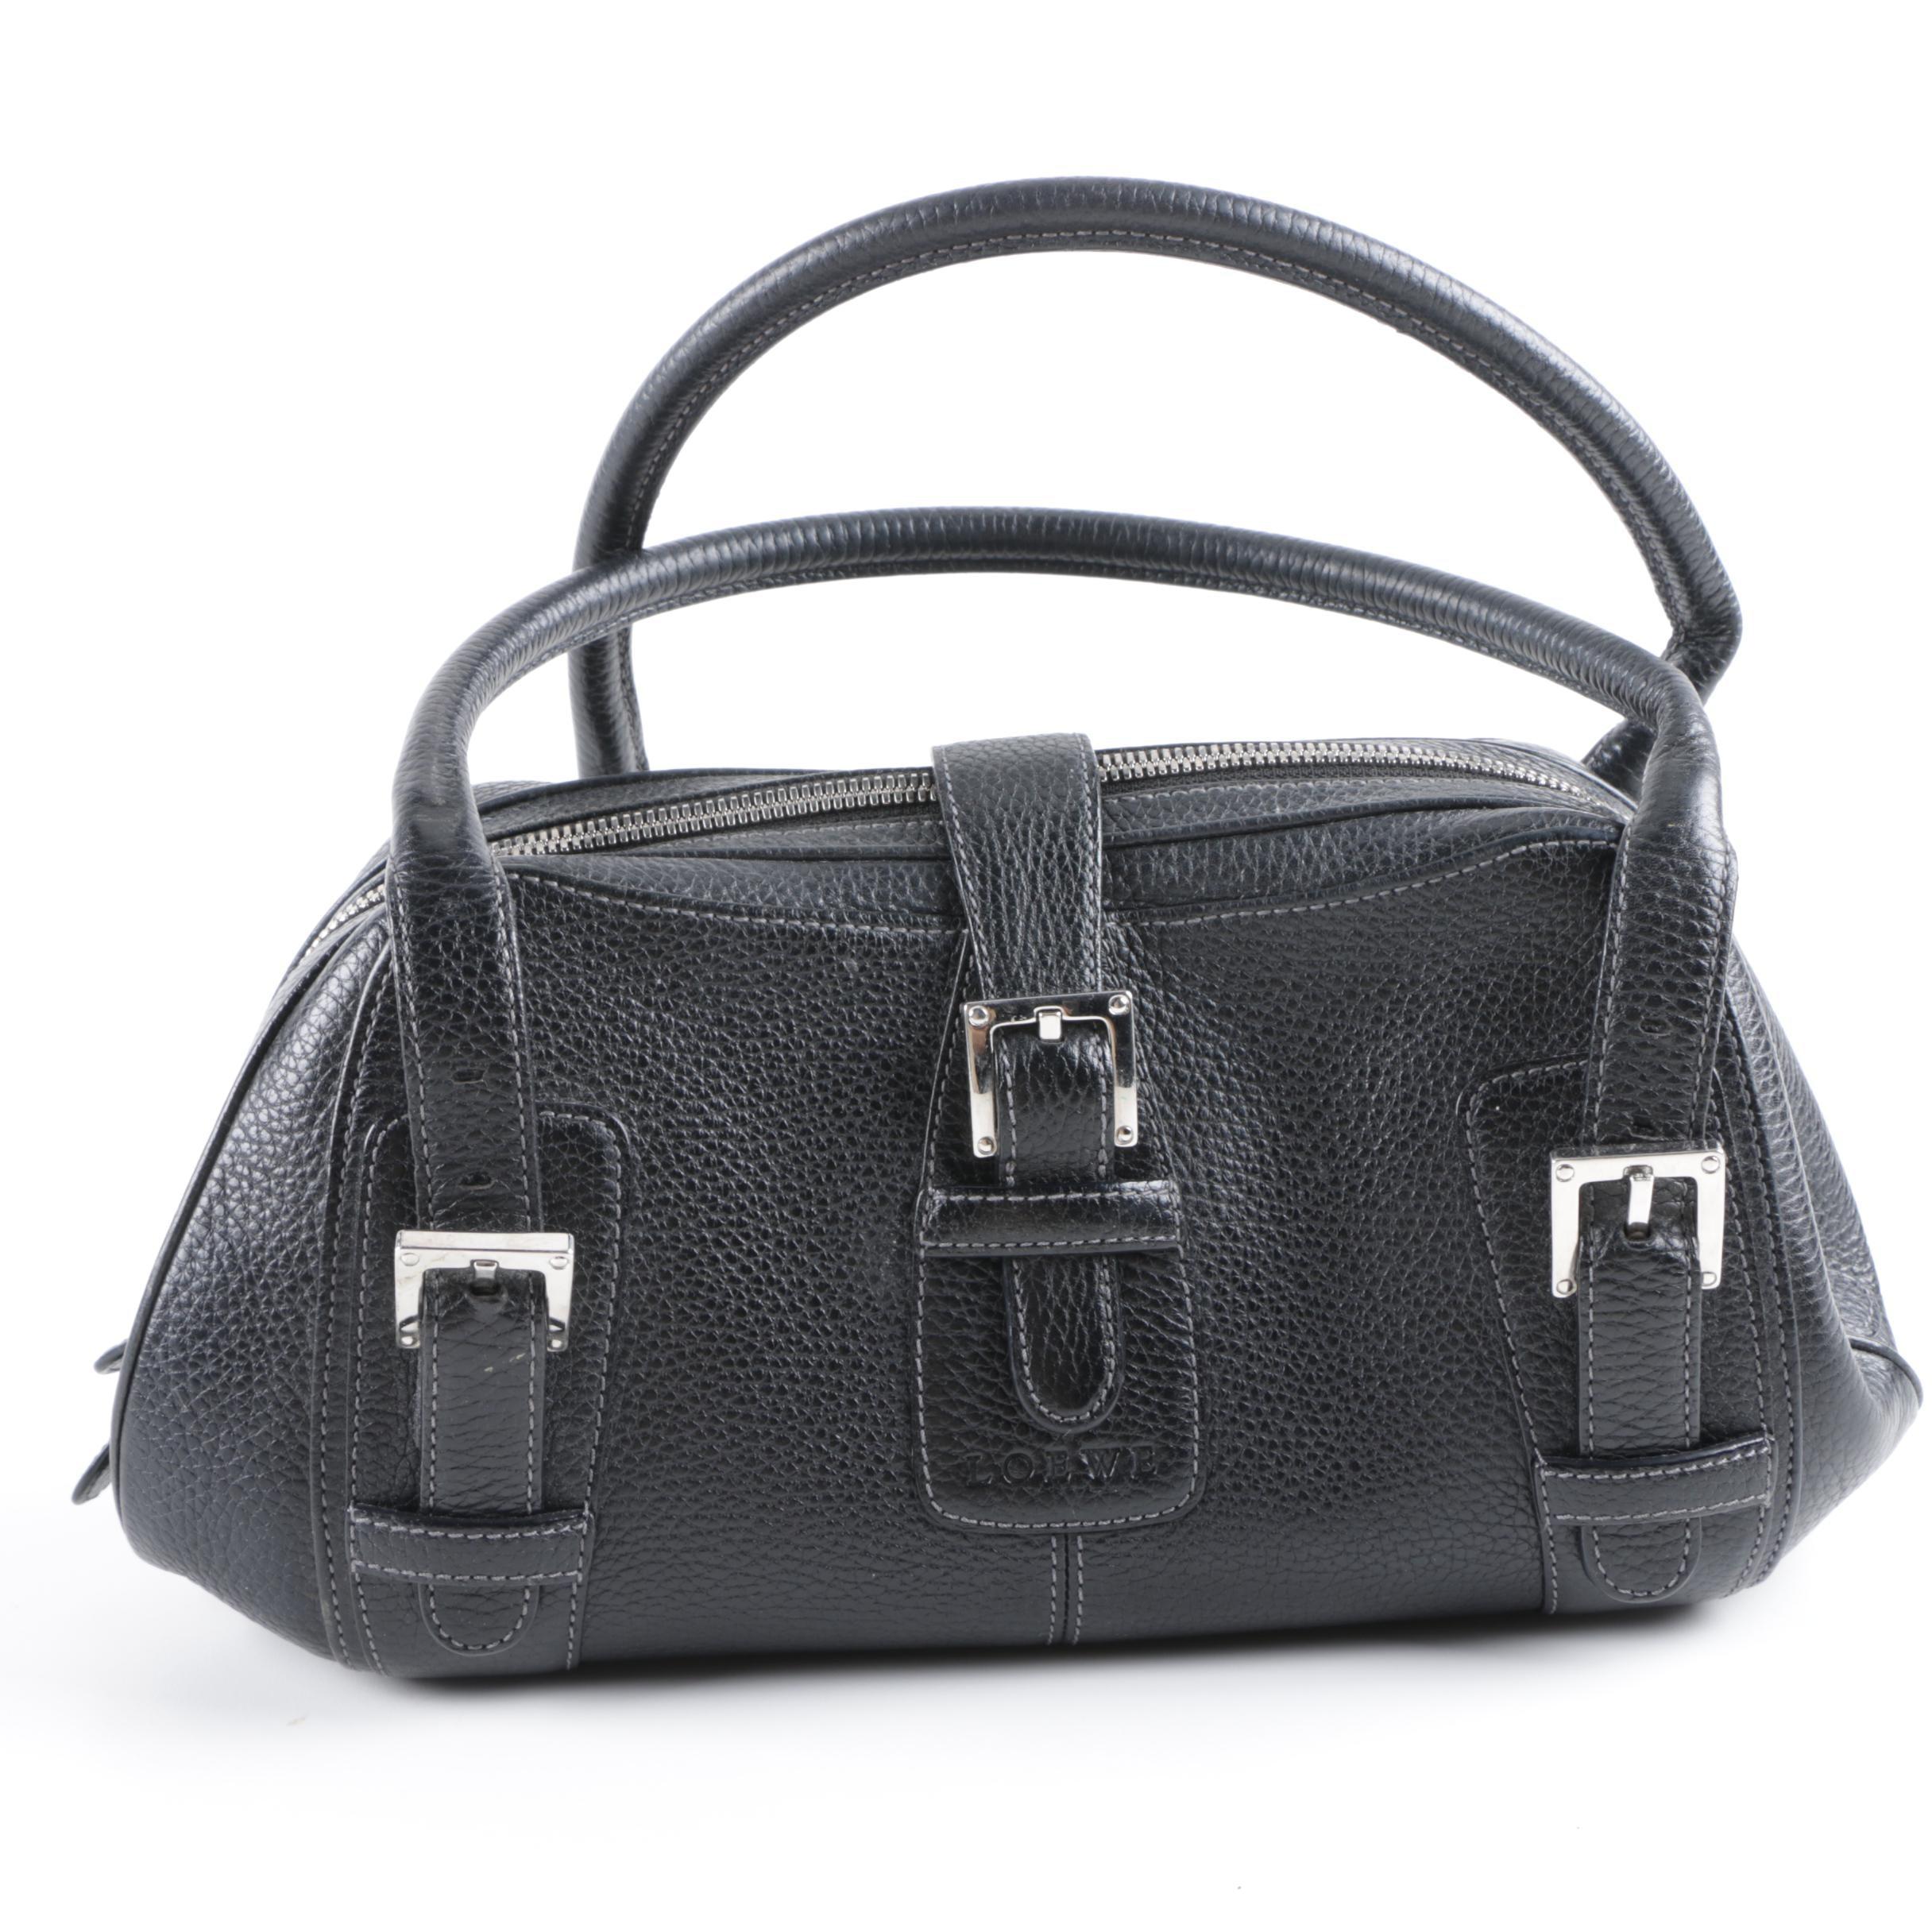 Loewe Black Pebbled Leather Baguette